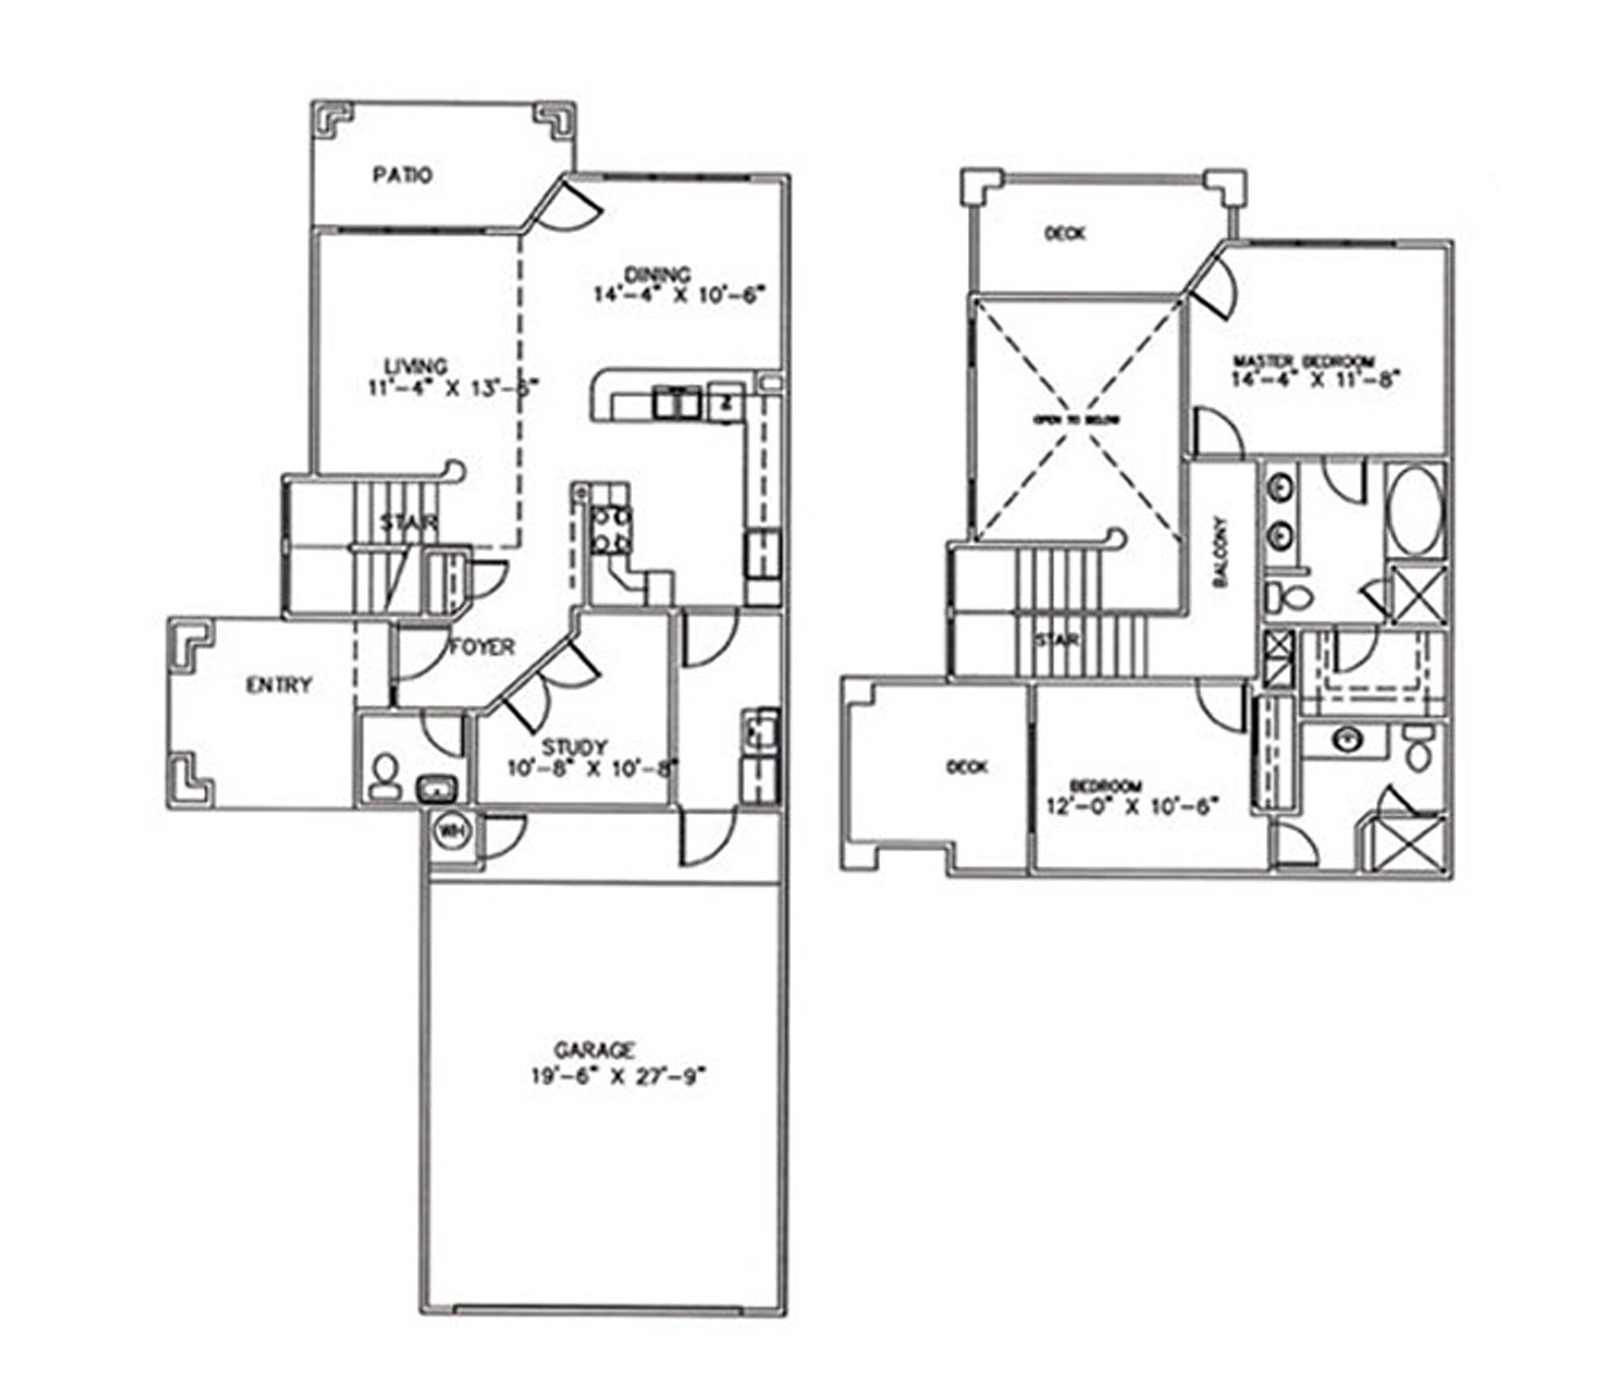 2 Bedrooms, Study, 2.5 Baths, Outdoor Kitchen,2 Car Garage